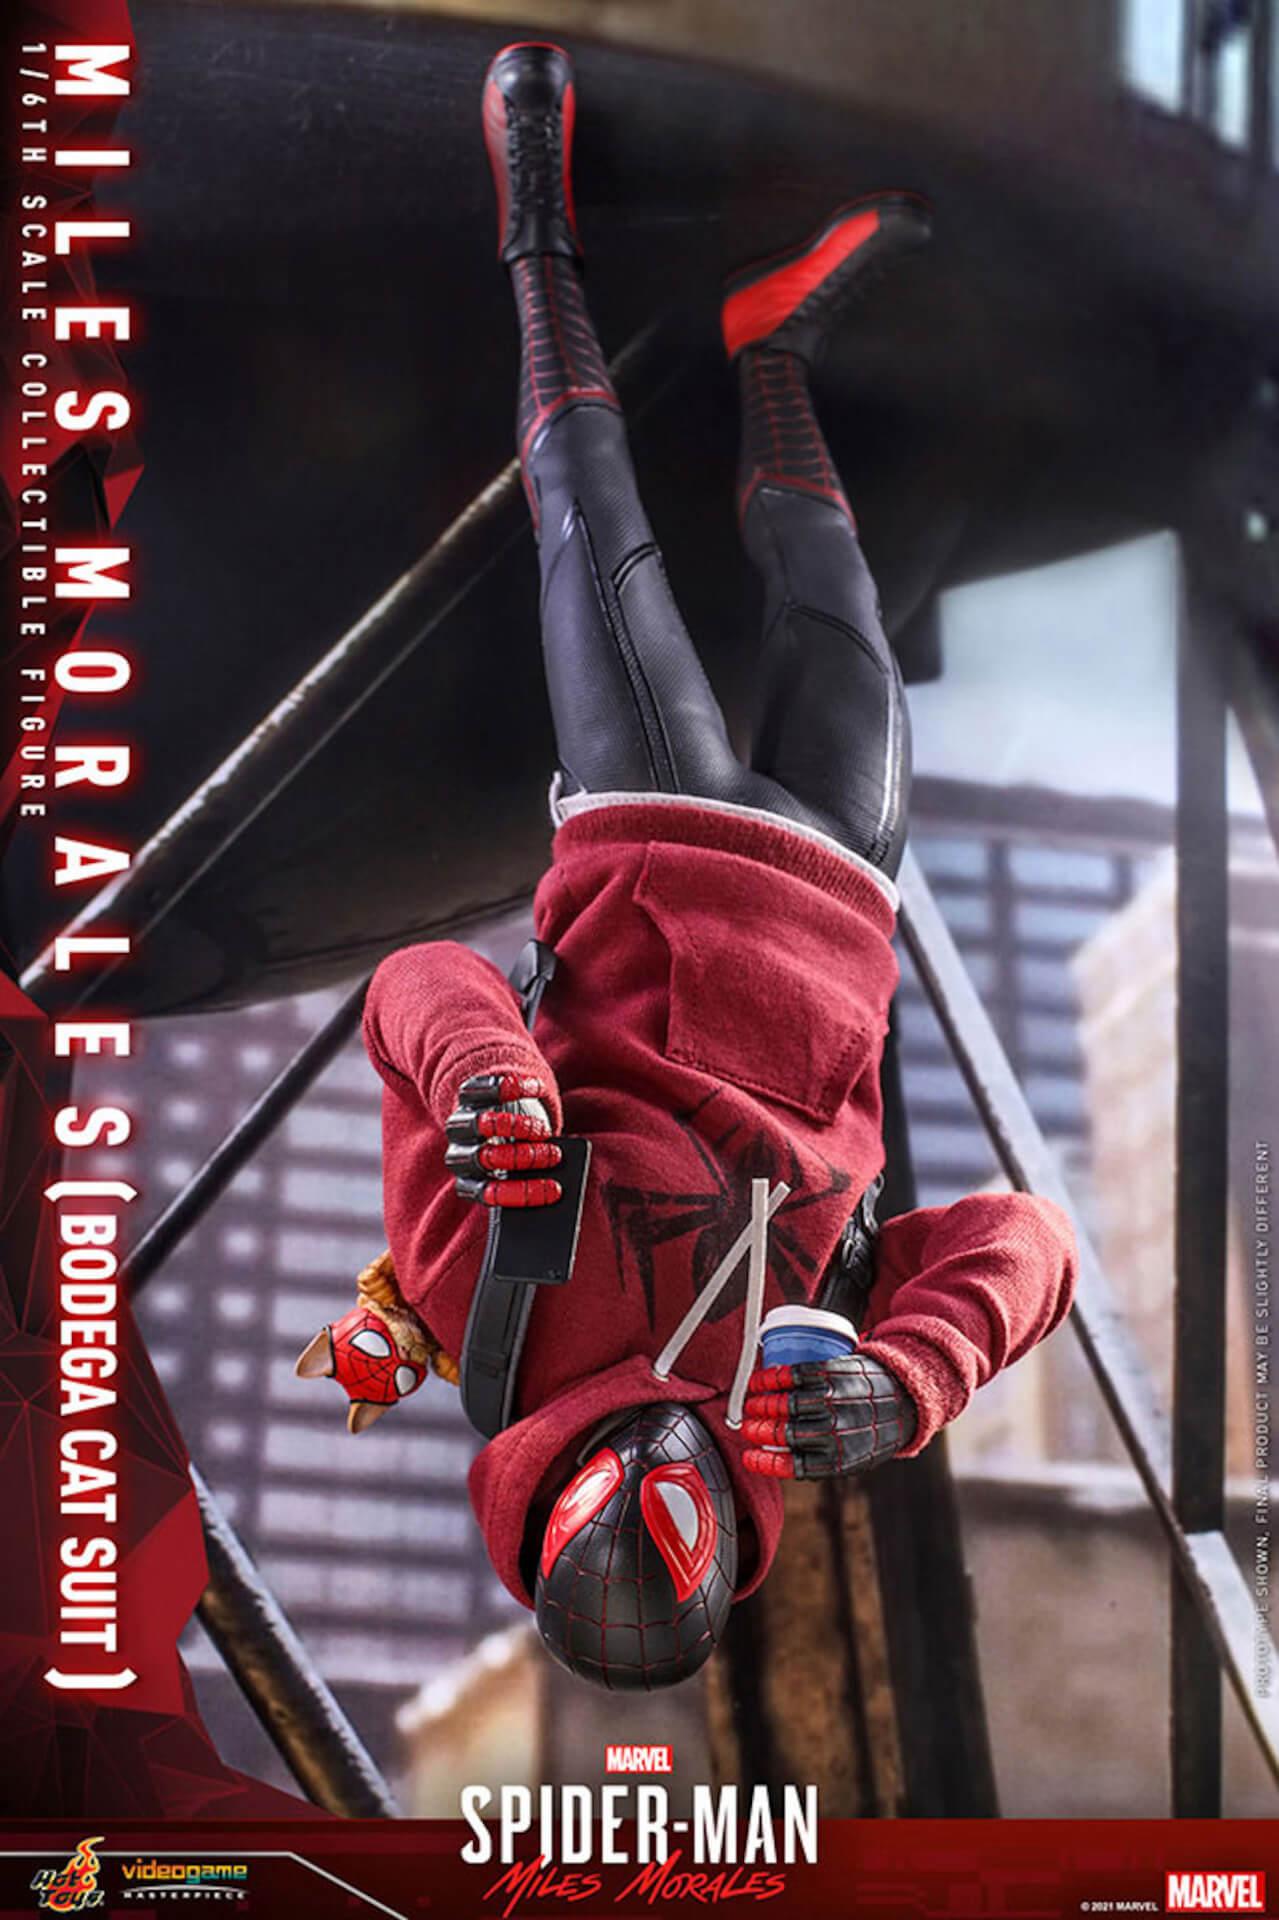 『Marvel's Spider-Man:Miles Morales』のスパイダーマンがホットトイズで超精巧なフィギュアになって登場! art210601_spiderman_hottoys_10